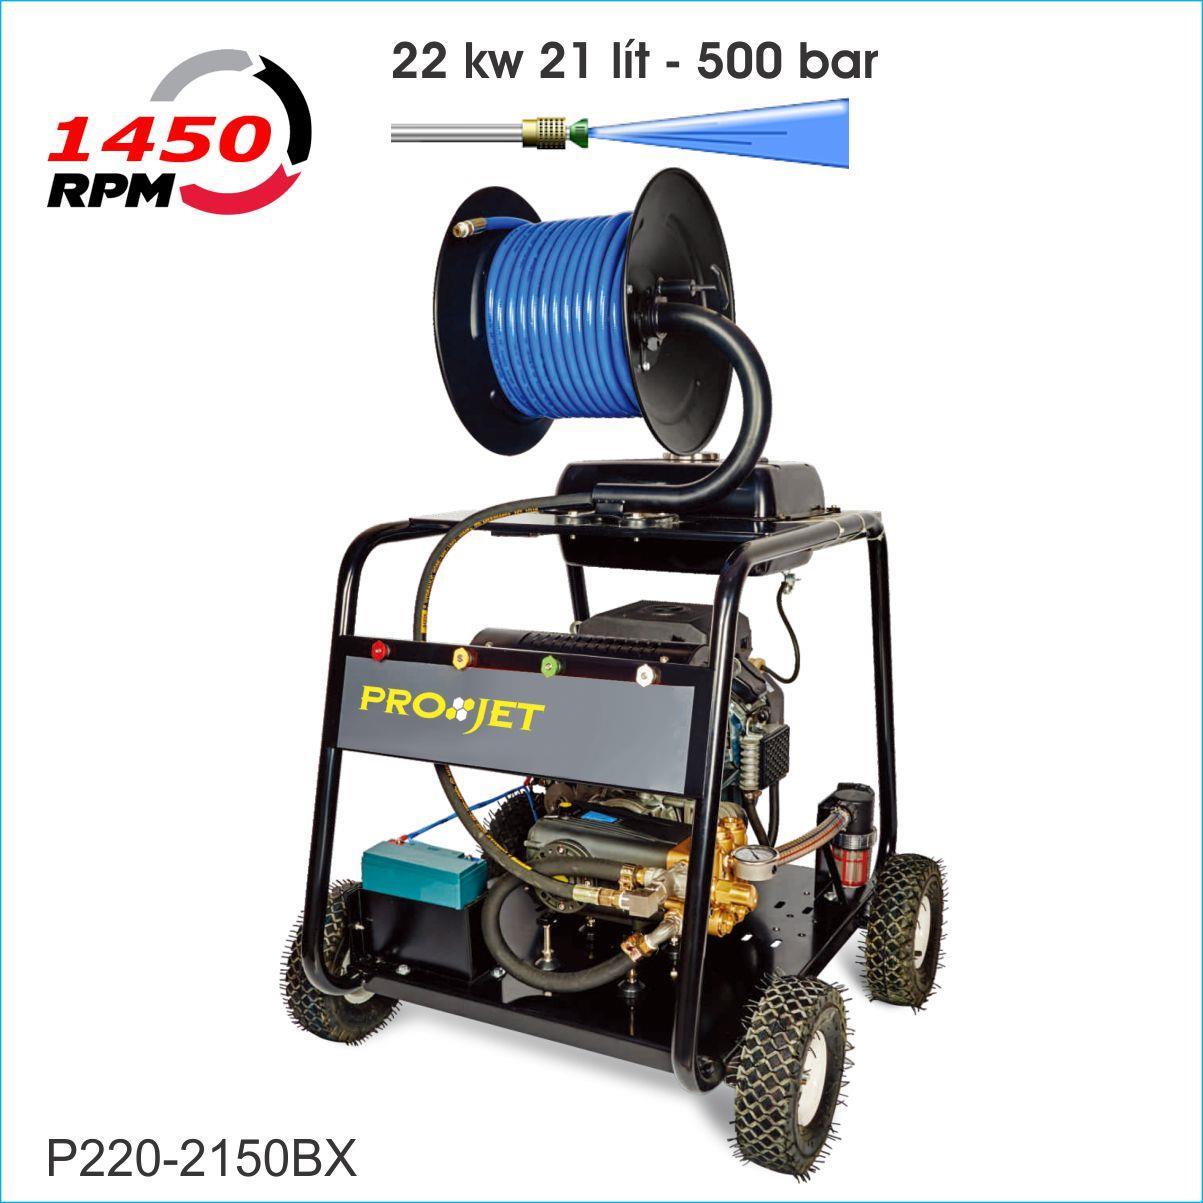 Máy phun rửa cao áp PROJET P220-2150BX